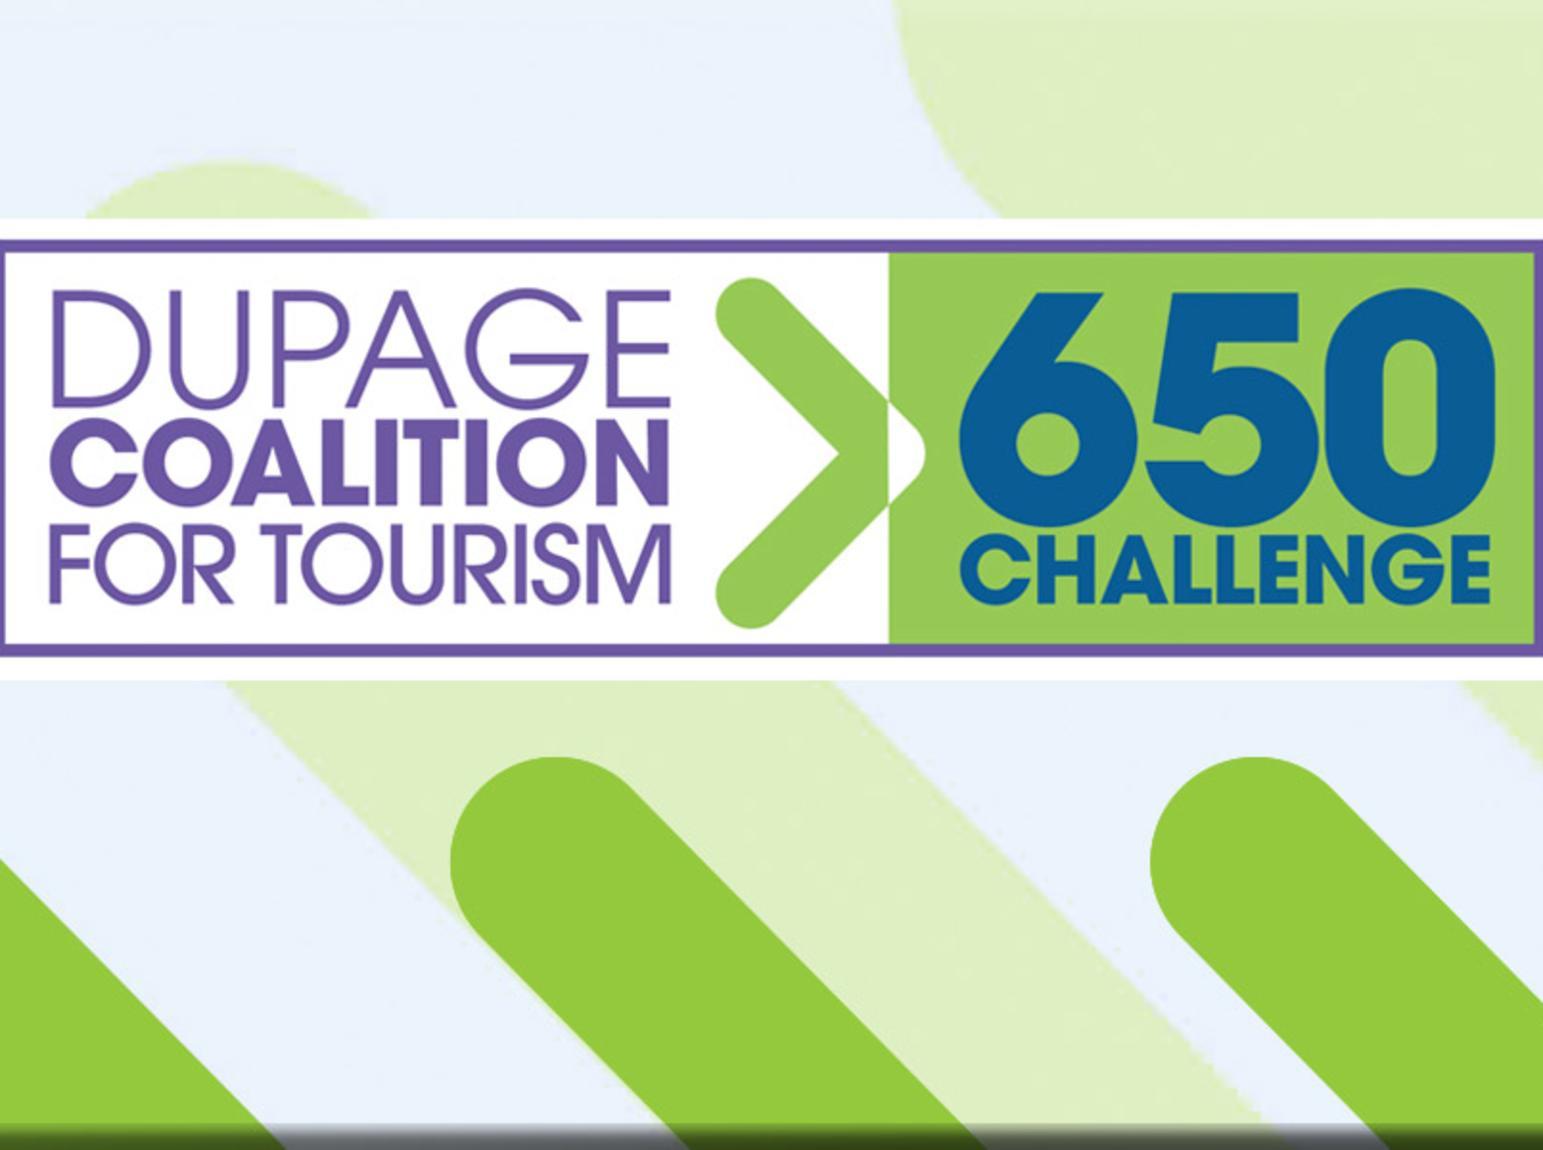 650 Challenge